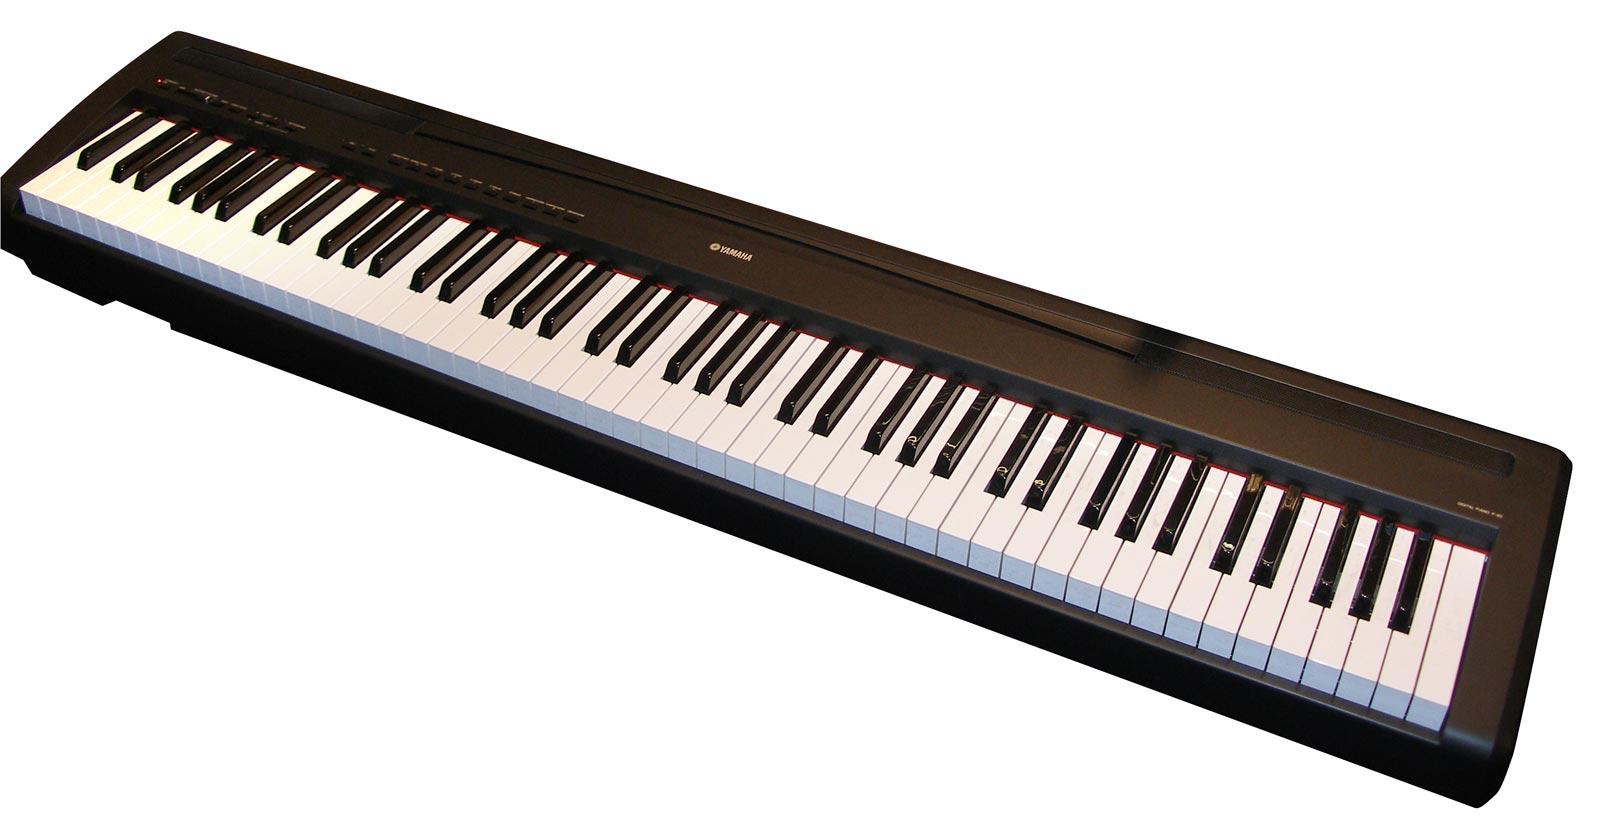 Yamaha p 85 image 466499 audiofanzine for Yamaha digital piano philippines